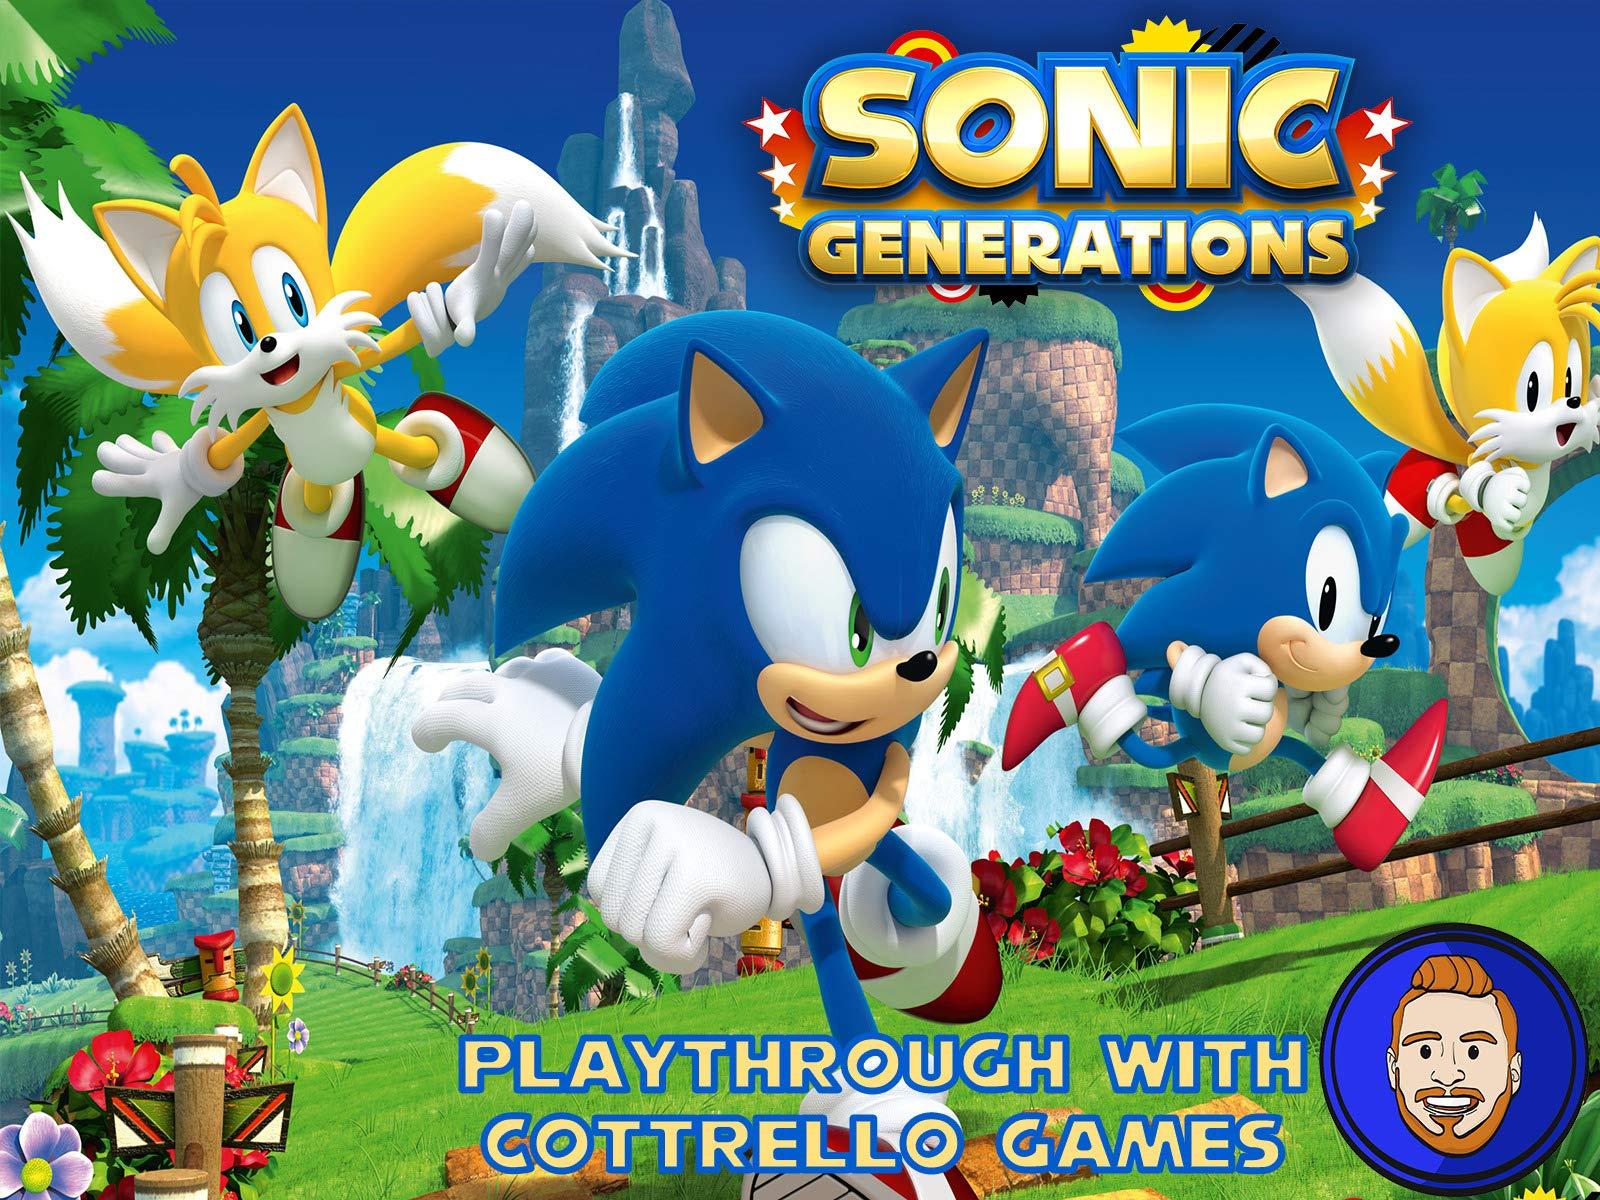 Watch Sonic Generations Playthrough With Cottrello Games On Amazon Prime Video Uk Newonamzprimeuk